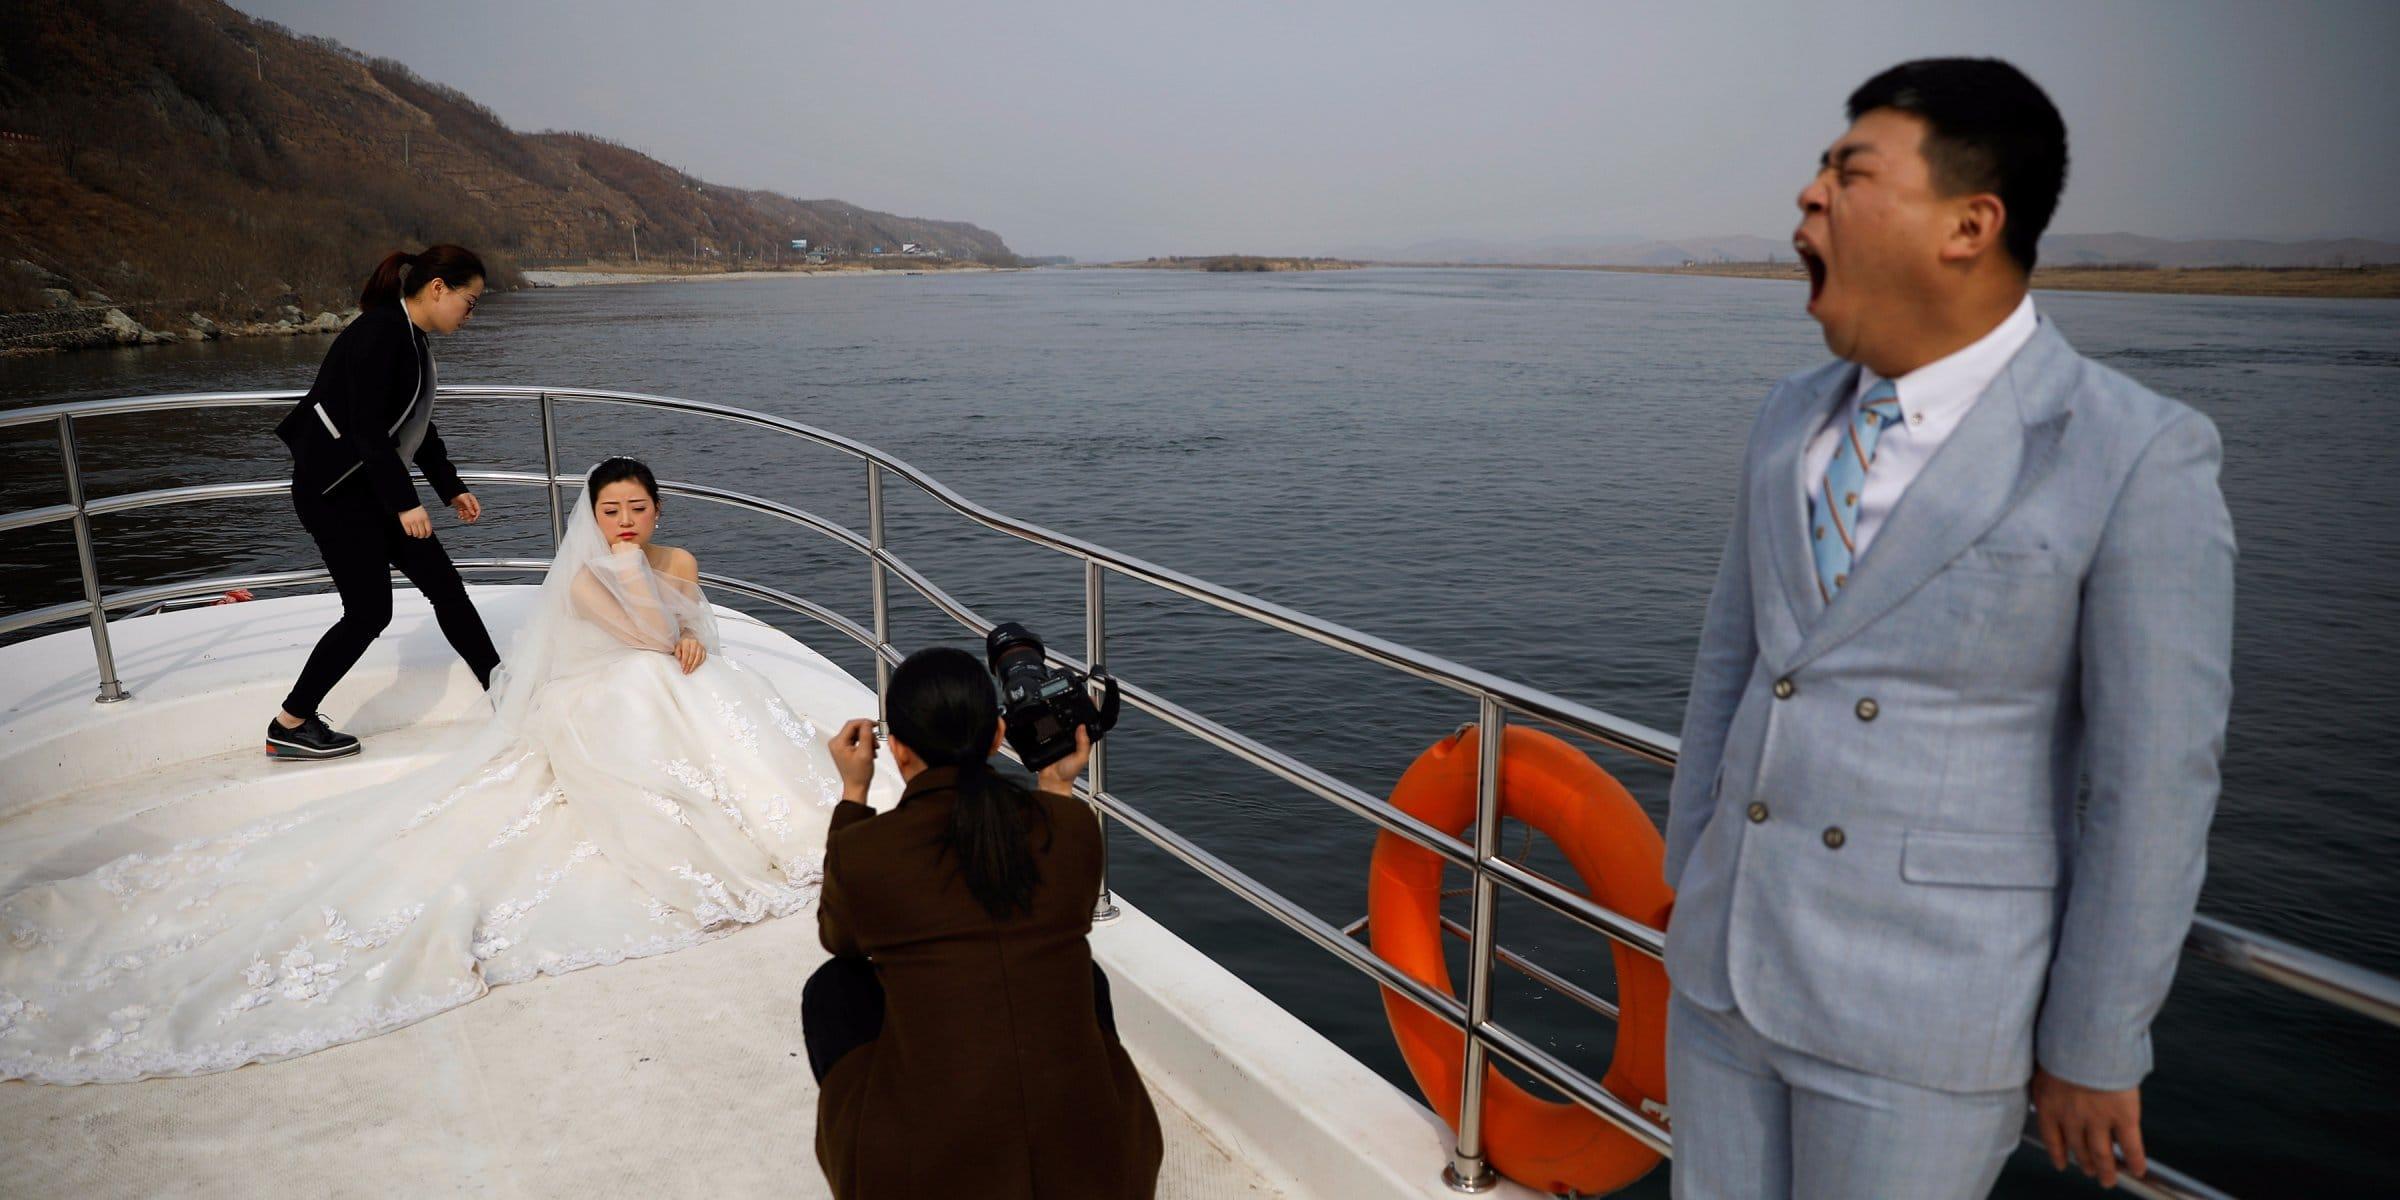 юрист по браку в корее